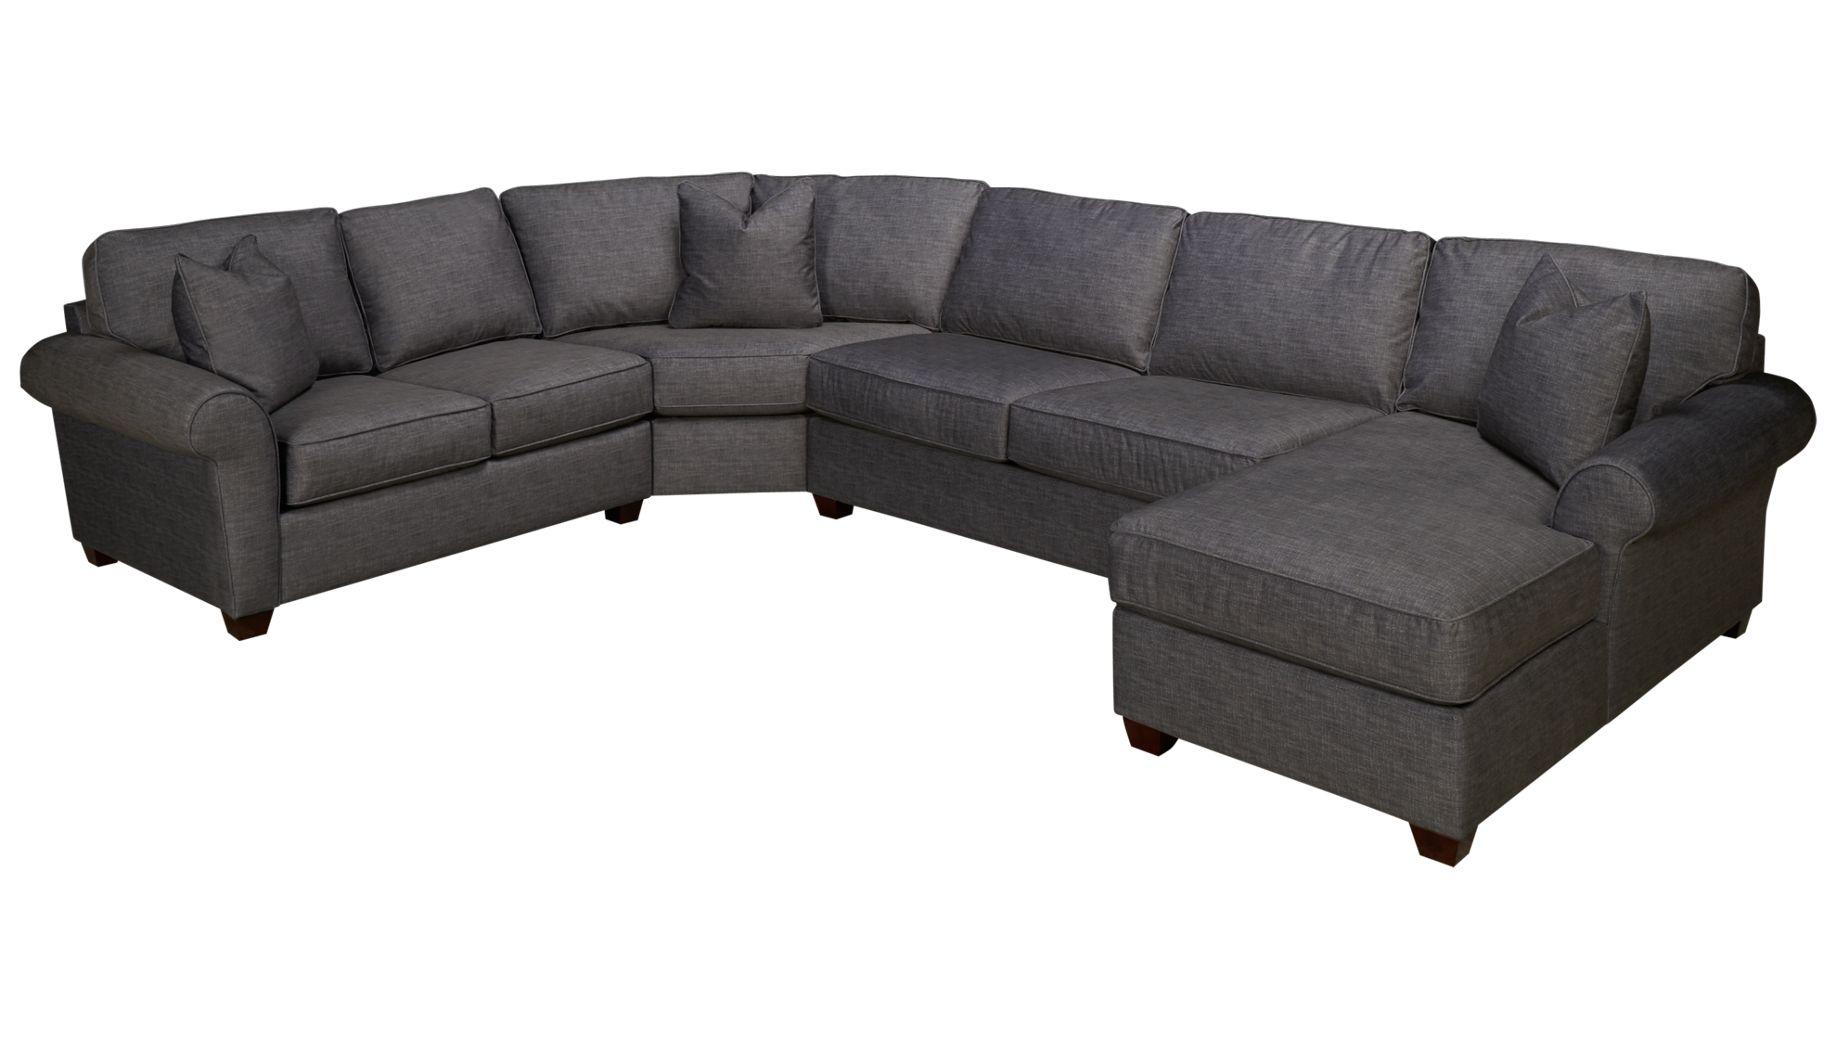 bauhaus sofa bauhaus sofas accent dealer locator thesofa. Black Bedroom Furniture Sets. Home Design Ideas